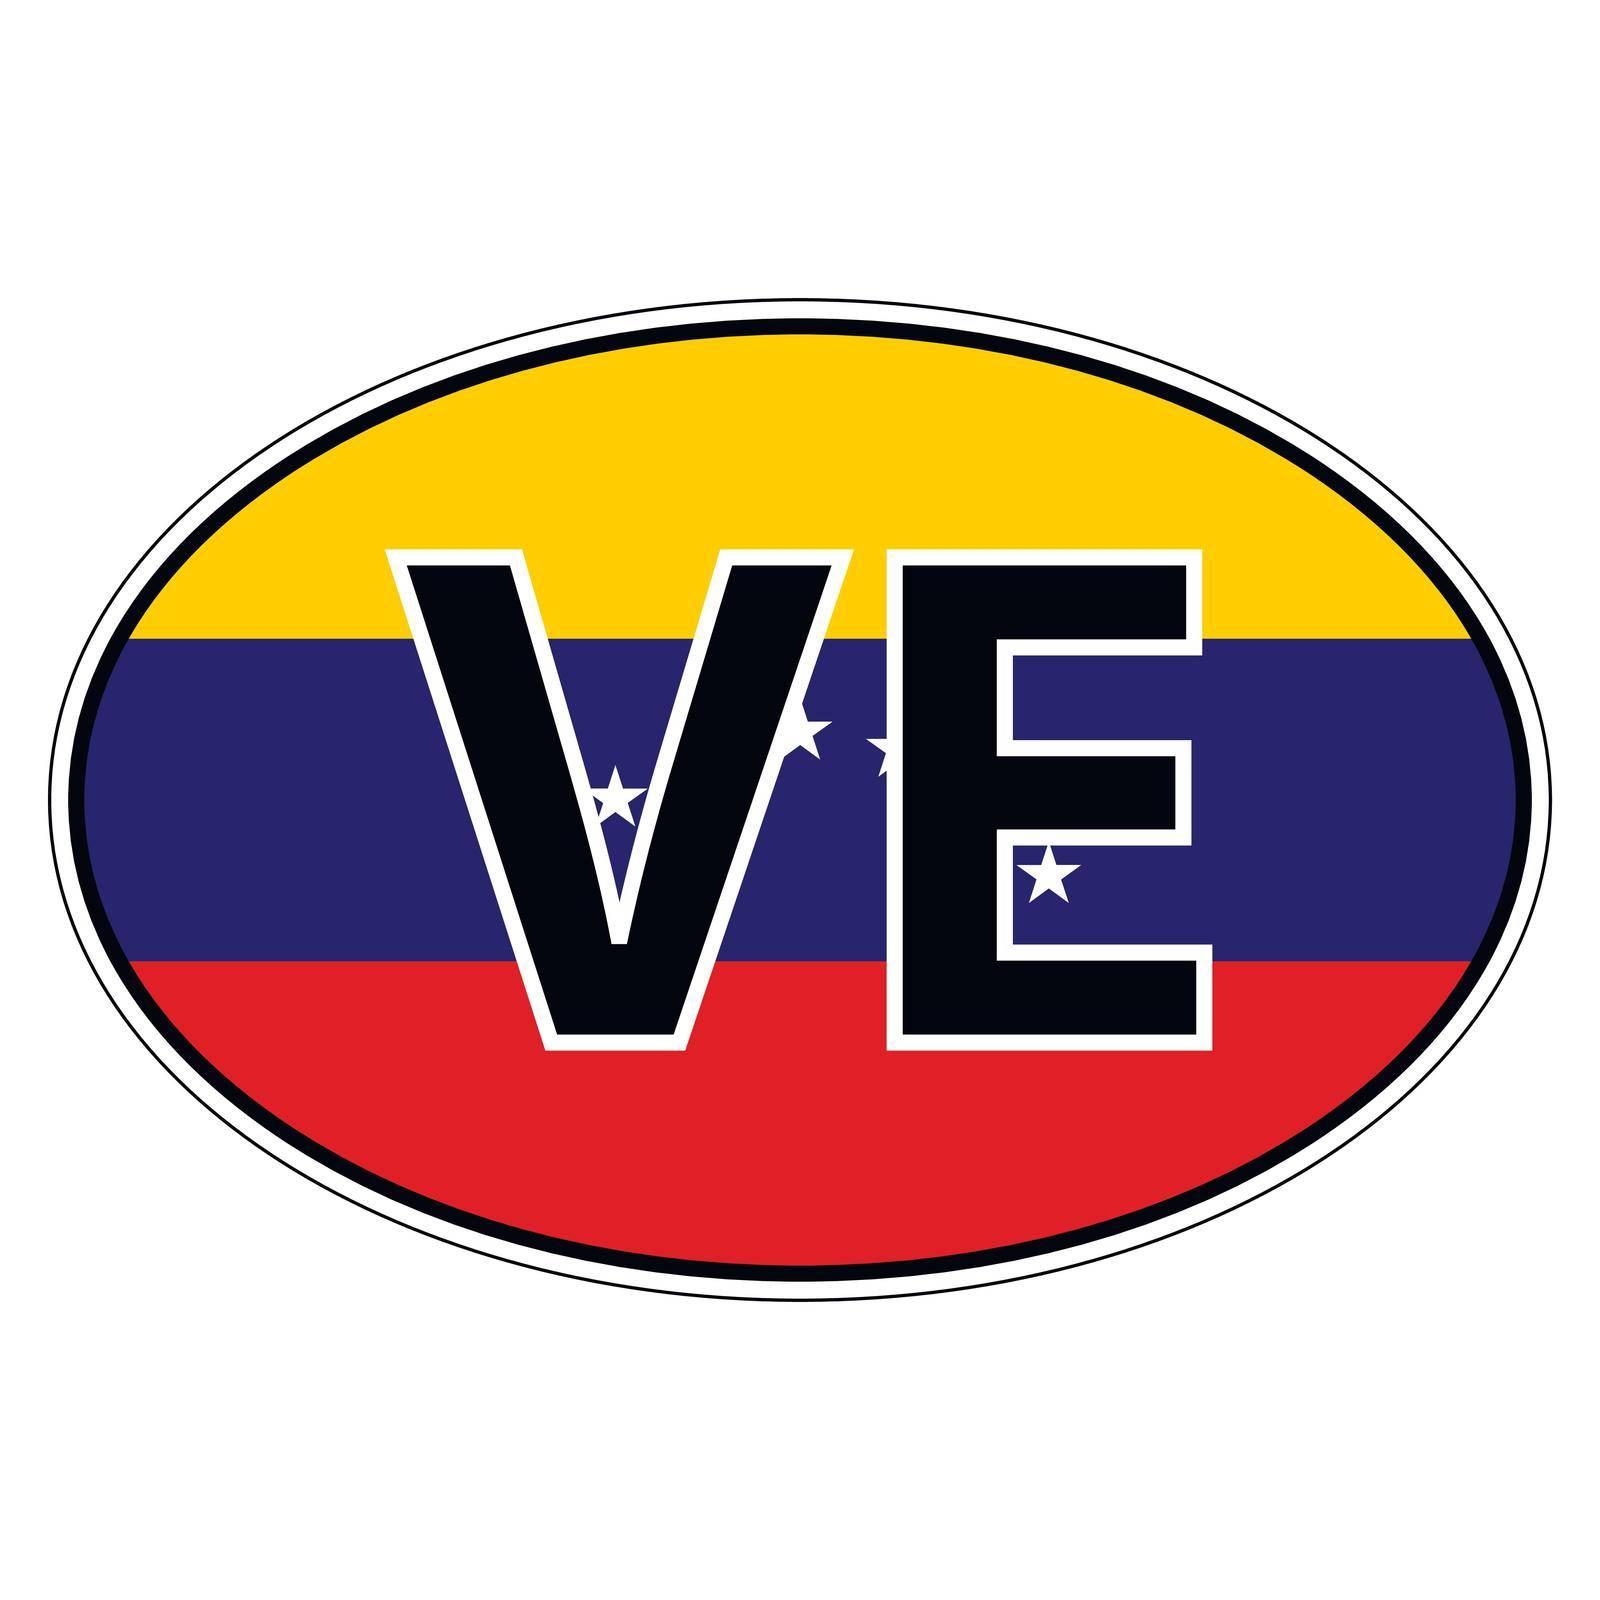 Sticker on car, flag Bolivarian Republic Venezuela by koksikoks